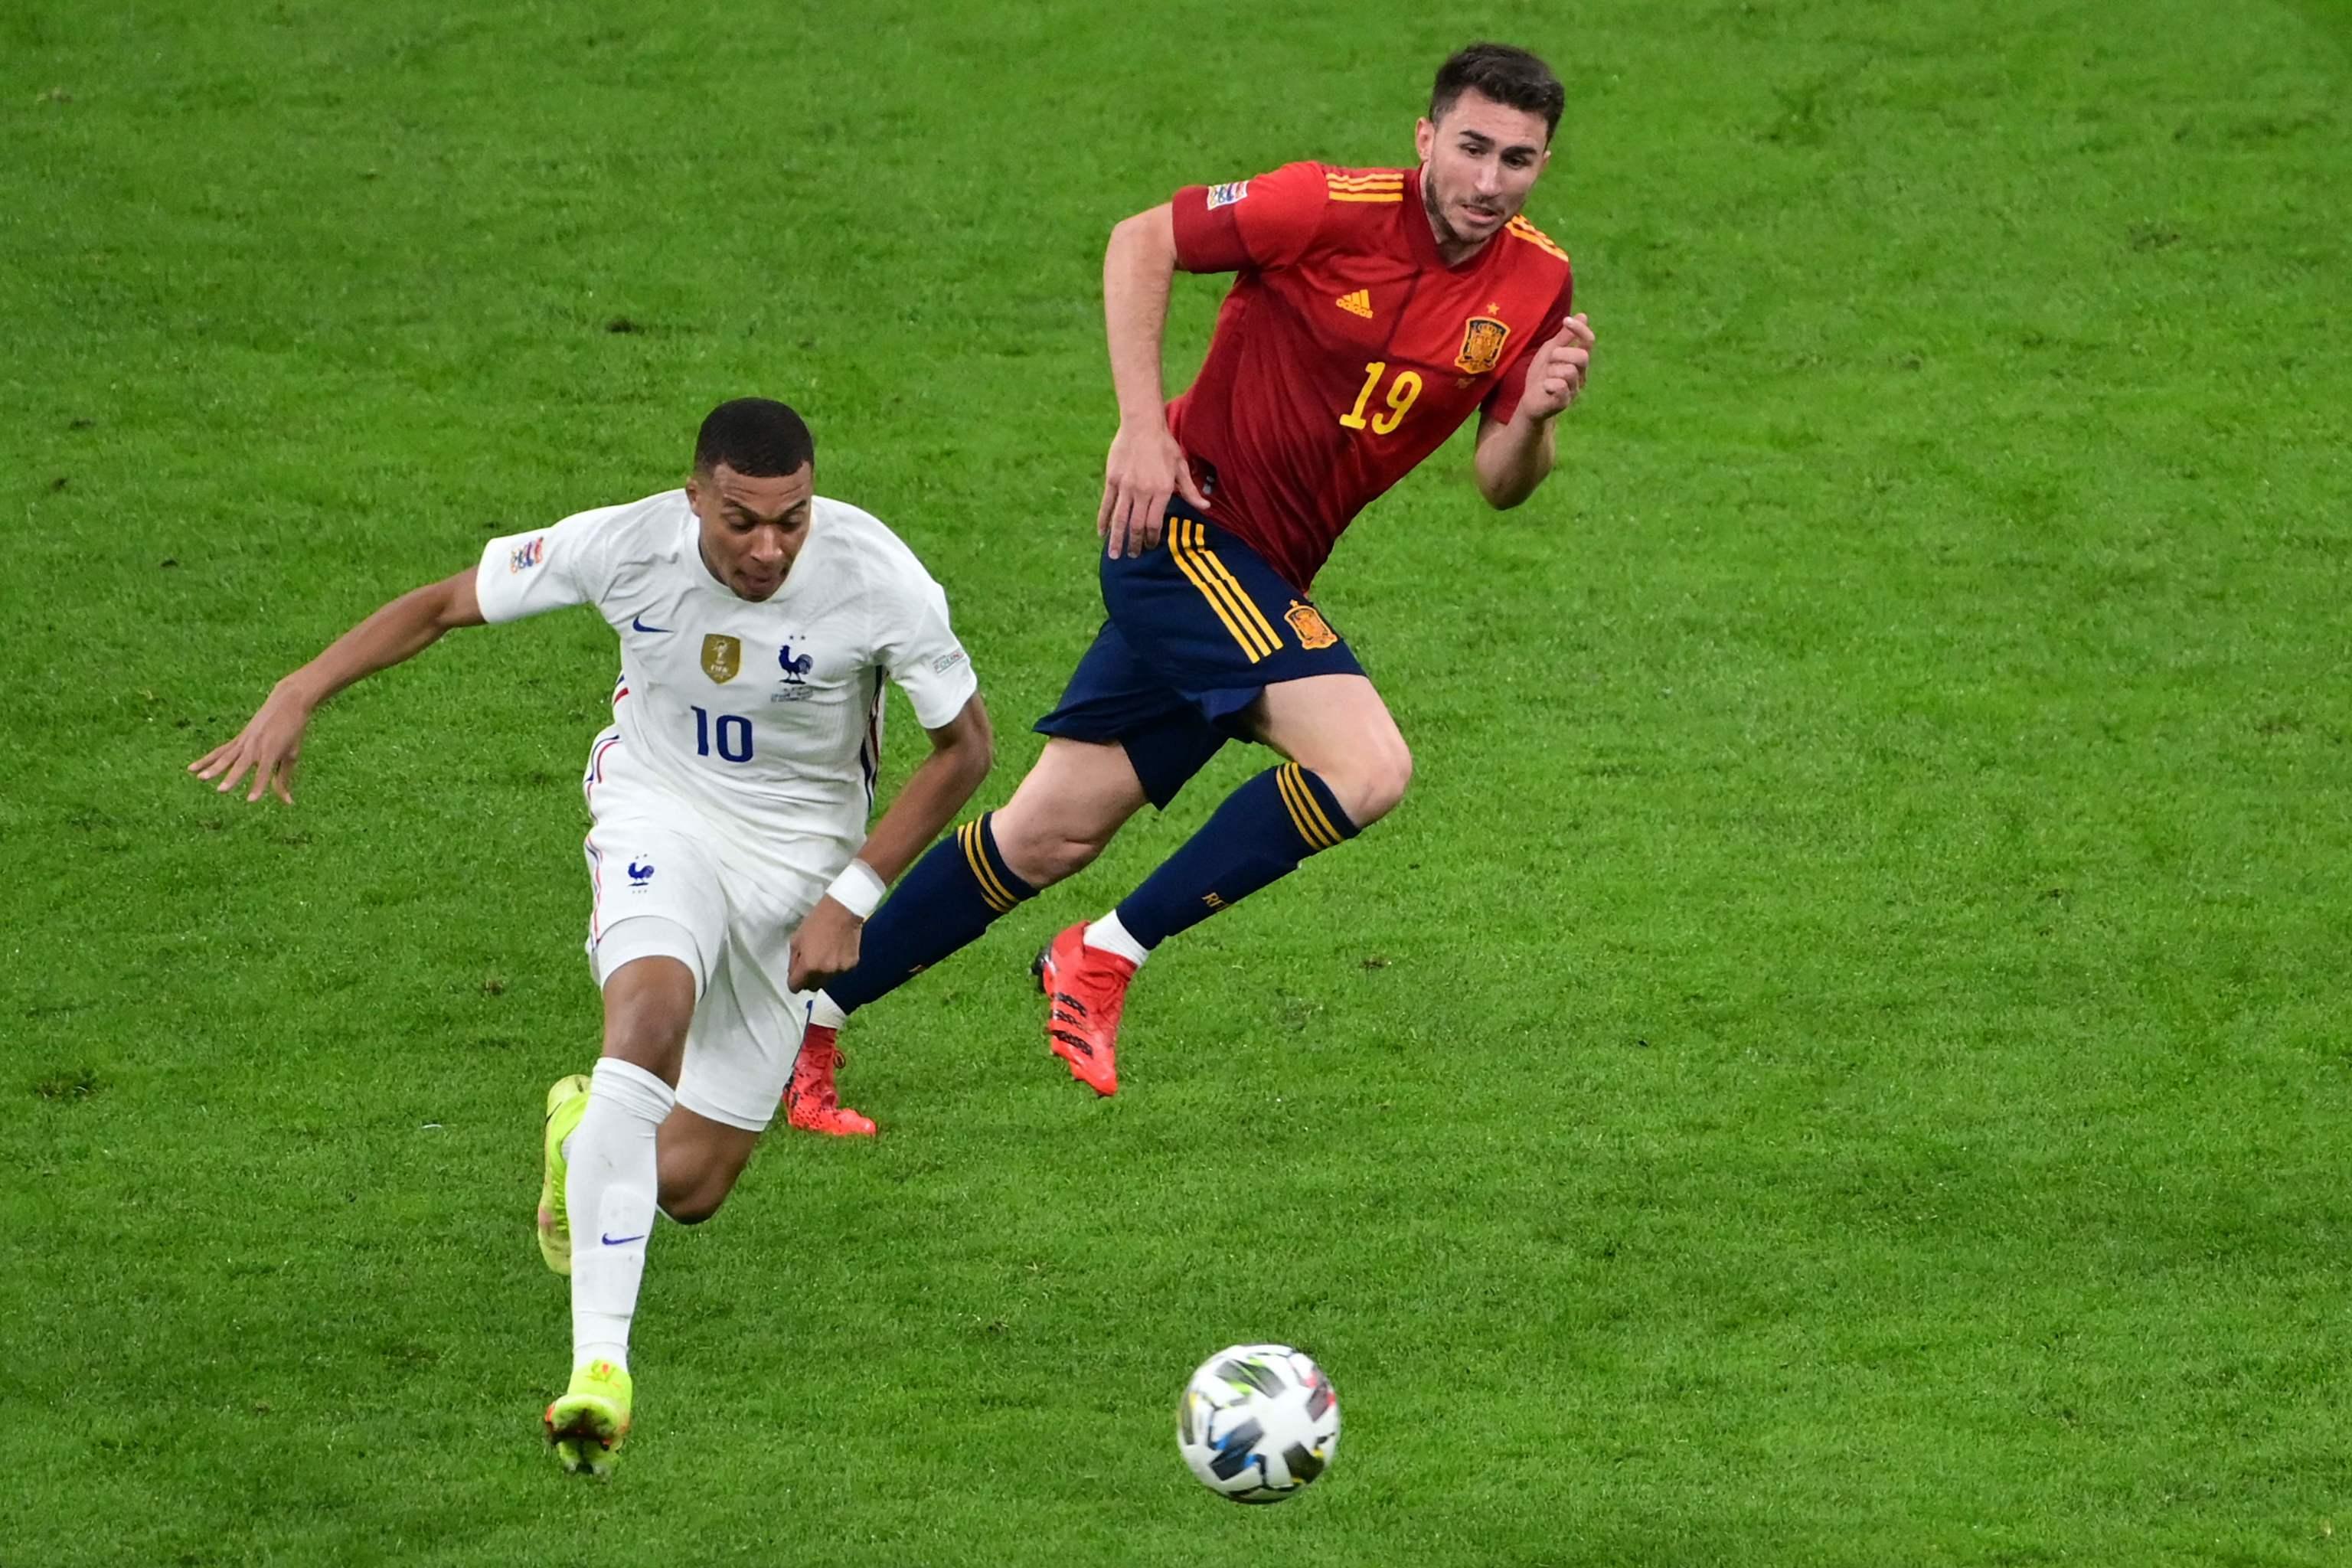 Mbappé arranca con el balón delante de Laporte.